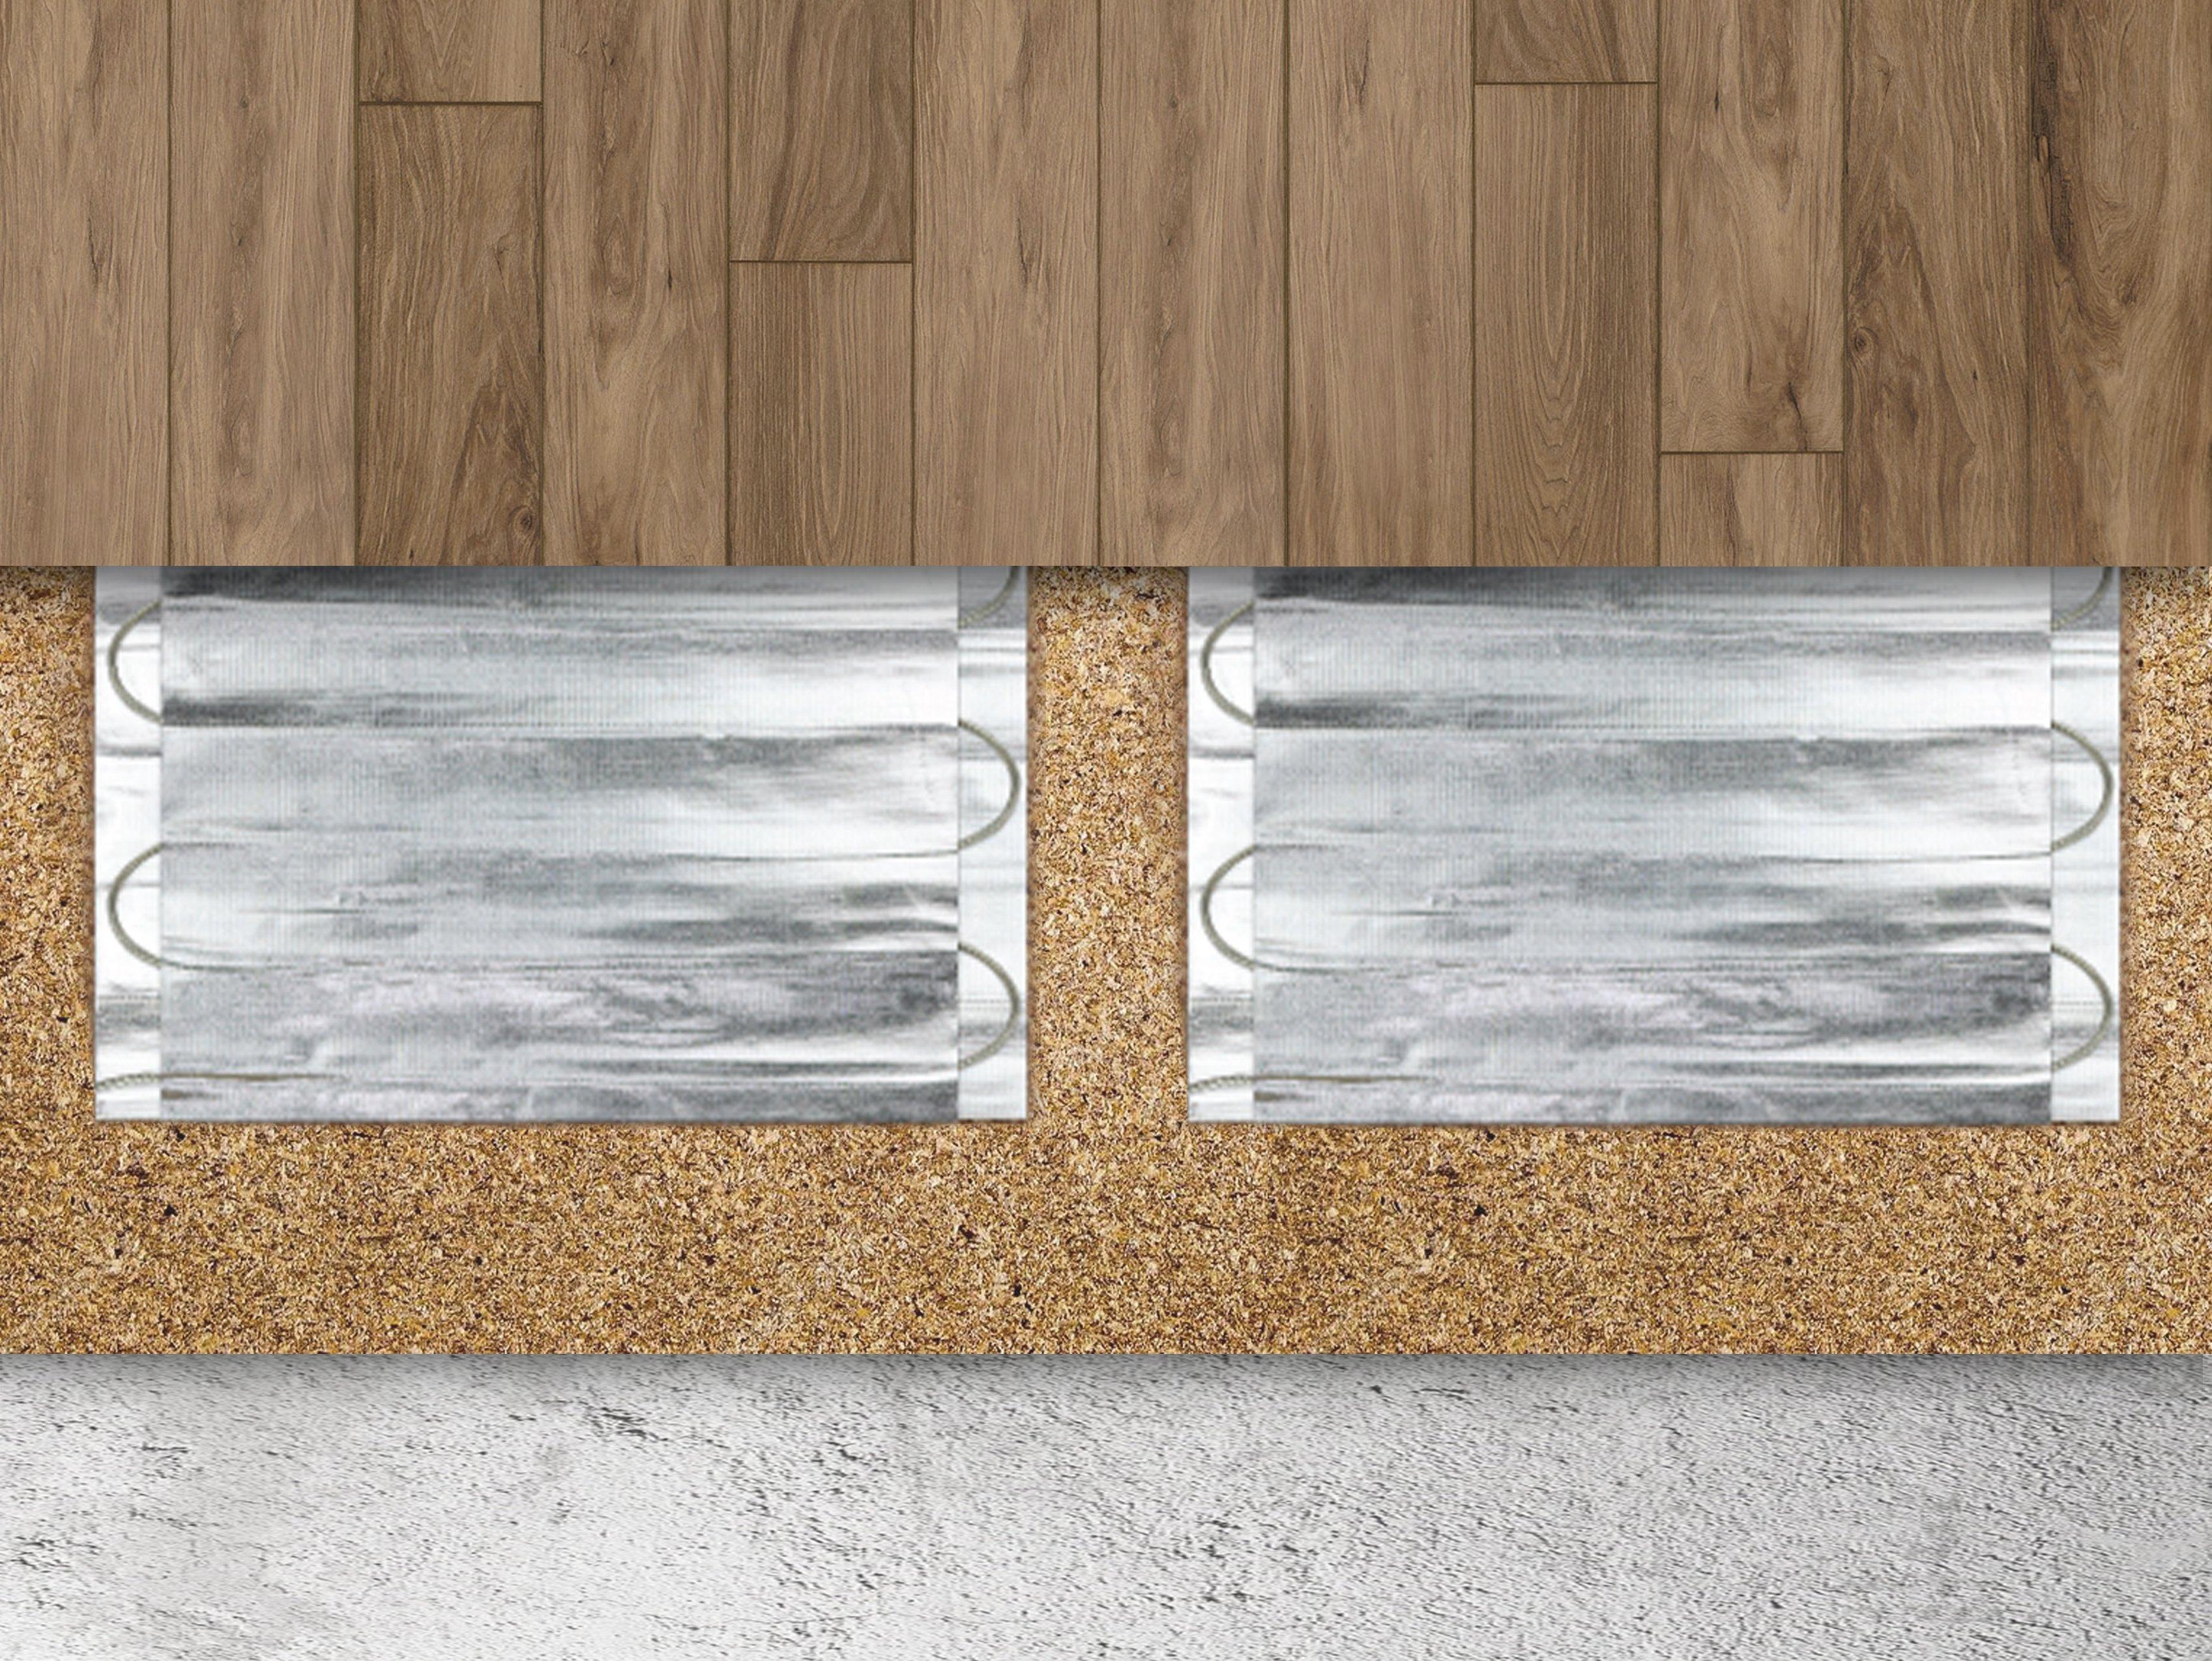 Floor Heating For Laminate Flooring